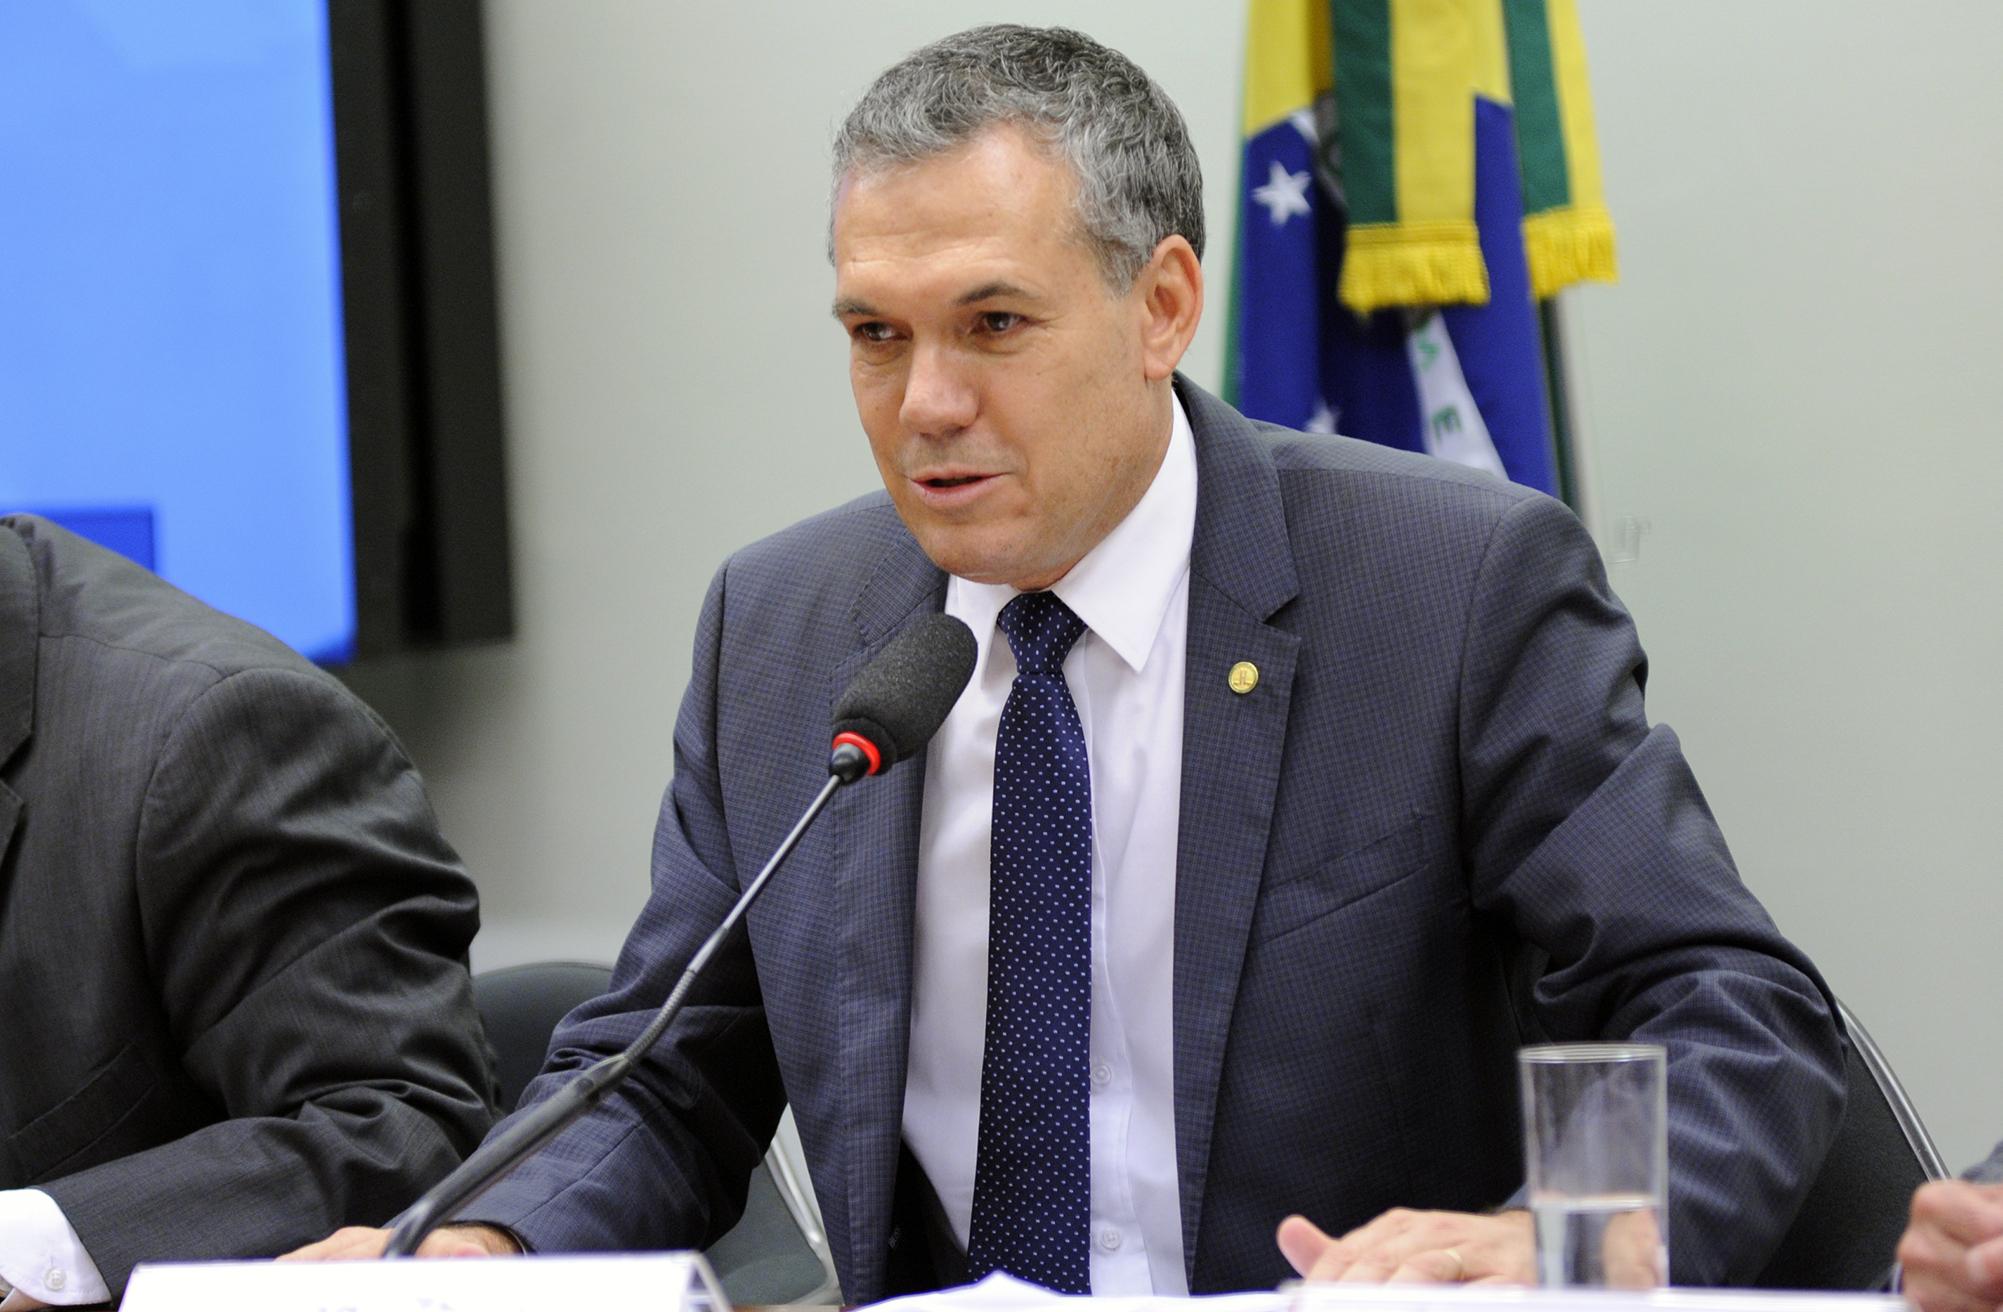 Audiência Pública. Dep. Zé Silva (SD - MG)